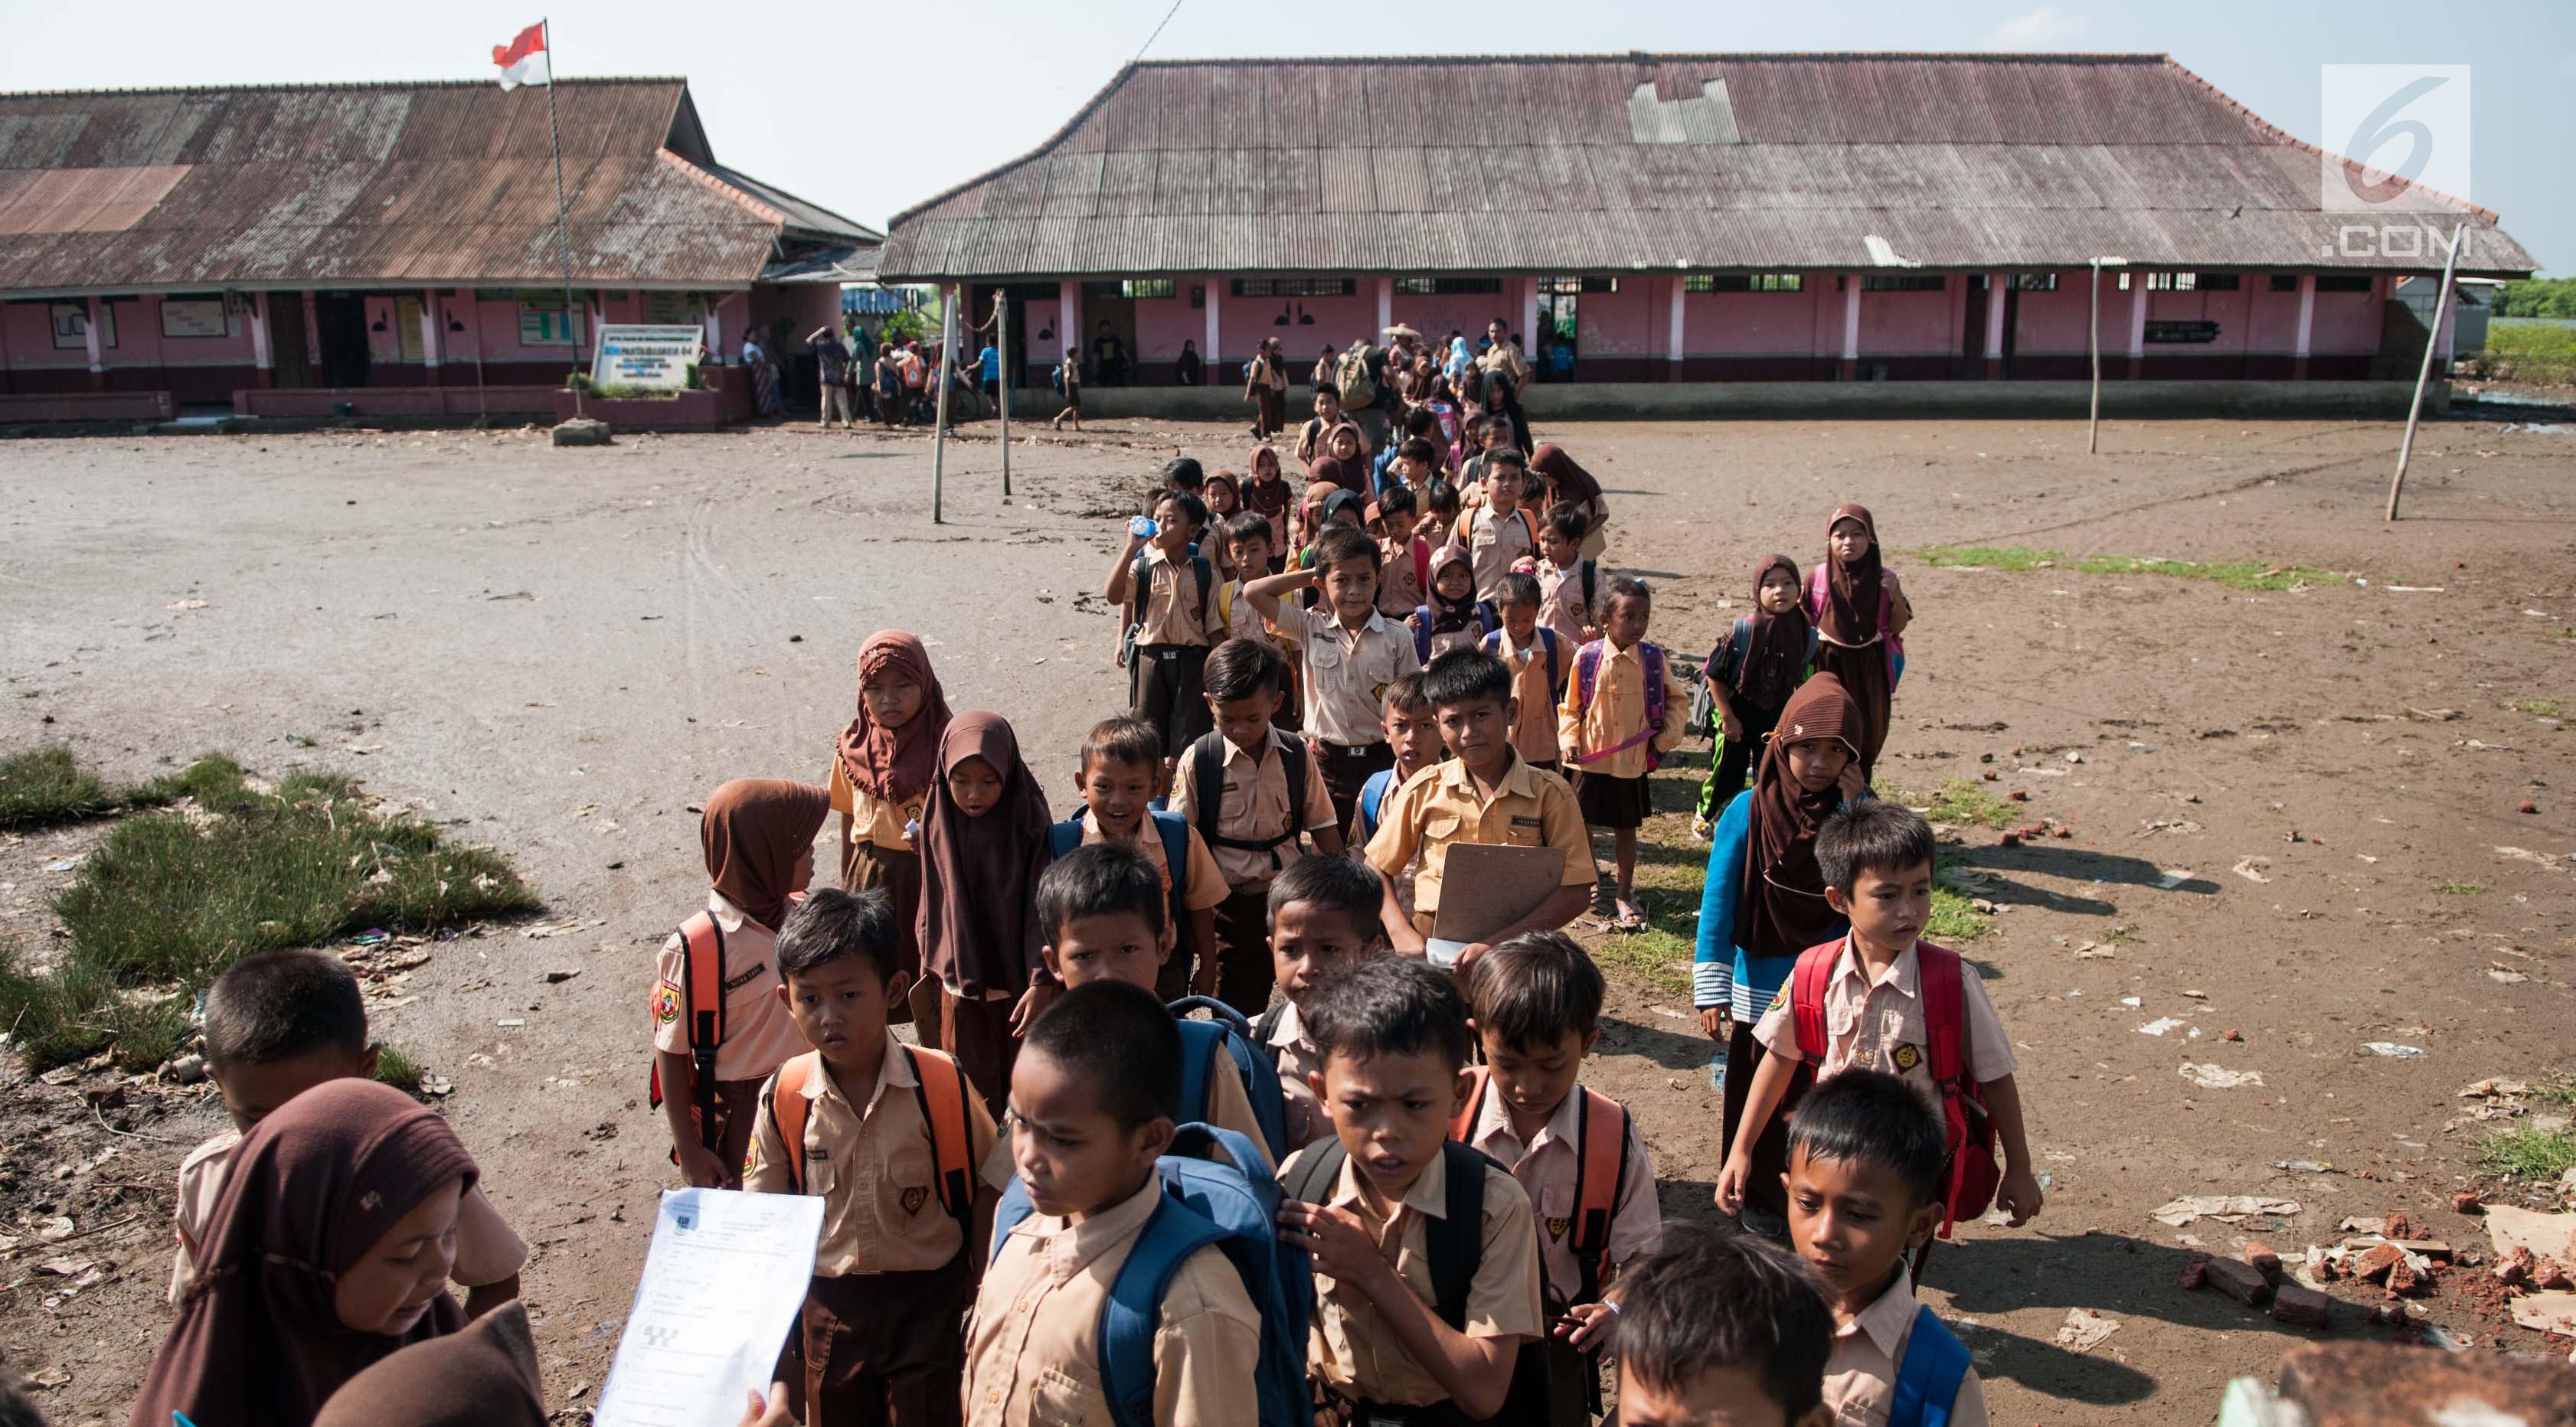 Sejumlah siswa keluar kelas usai kegiatan belajar mengajar selesai di SDN 04 Pantai Bahagia, Muara Gembong, Jawa Barat, Jumat (9/6). Banjir Rob yang sering melanda kawasan ini menyebabkan kondisi bangunan memprihatinkan. (Liputan6.com/Gempur M Surya)